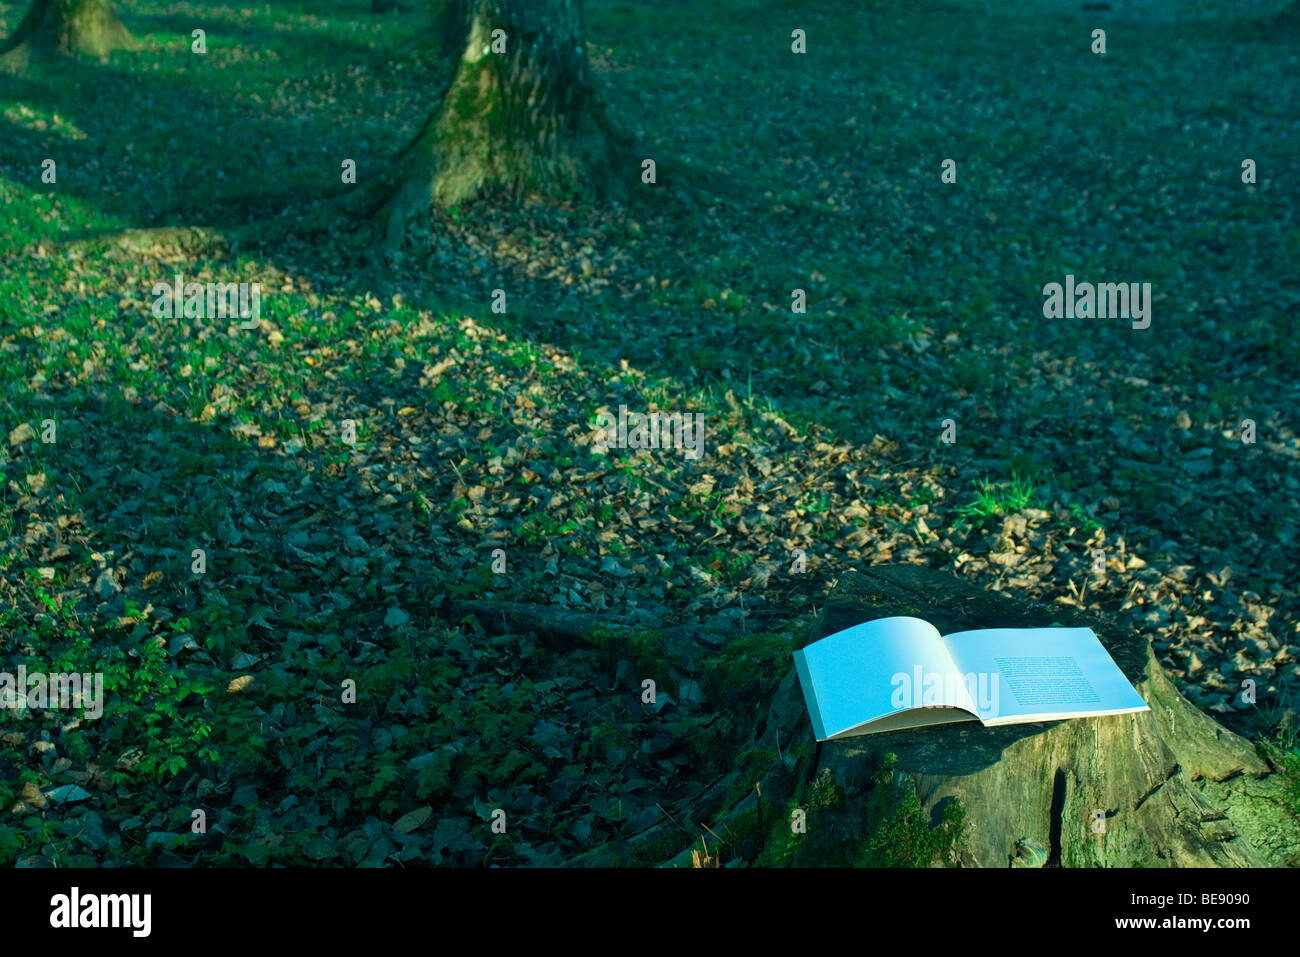 Open book lying on tree stump - Stock Image